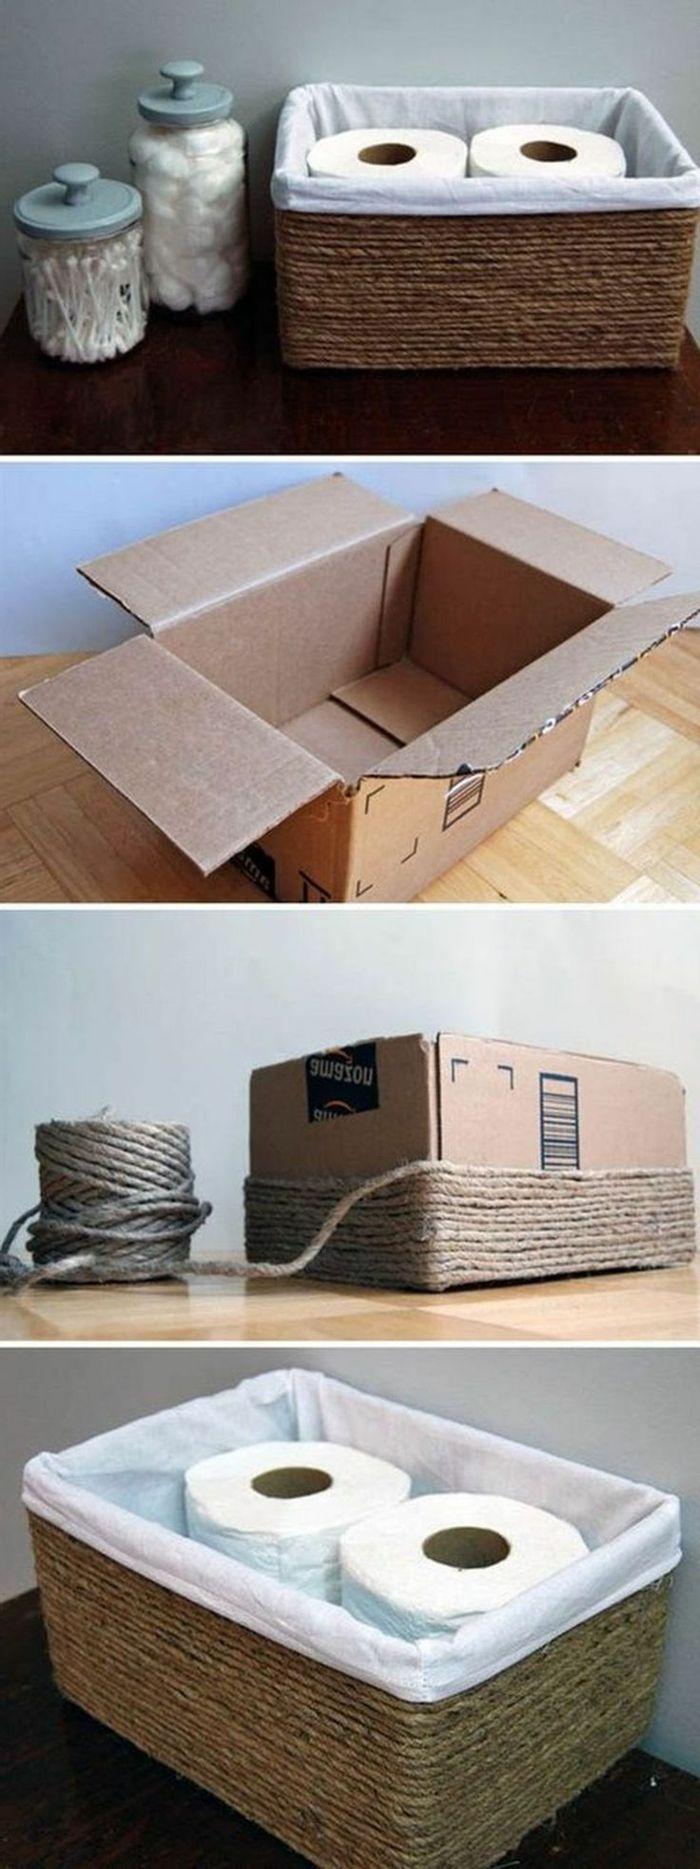 Photo of ▷ 1001+ kreative und nützliche Upcycling Ideen zur Inspiration